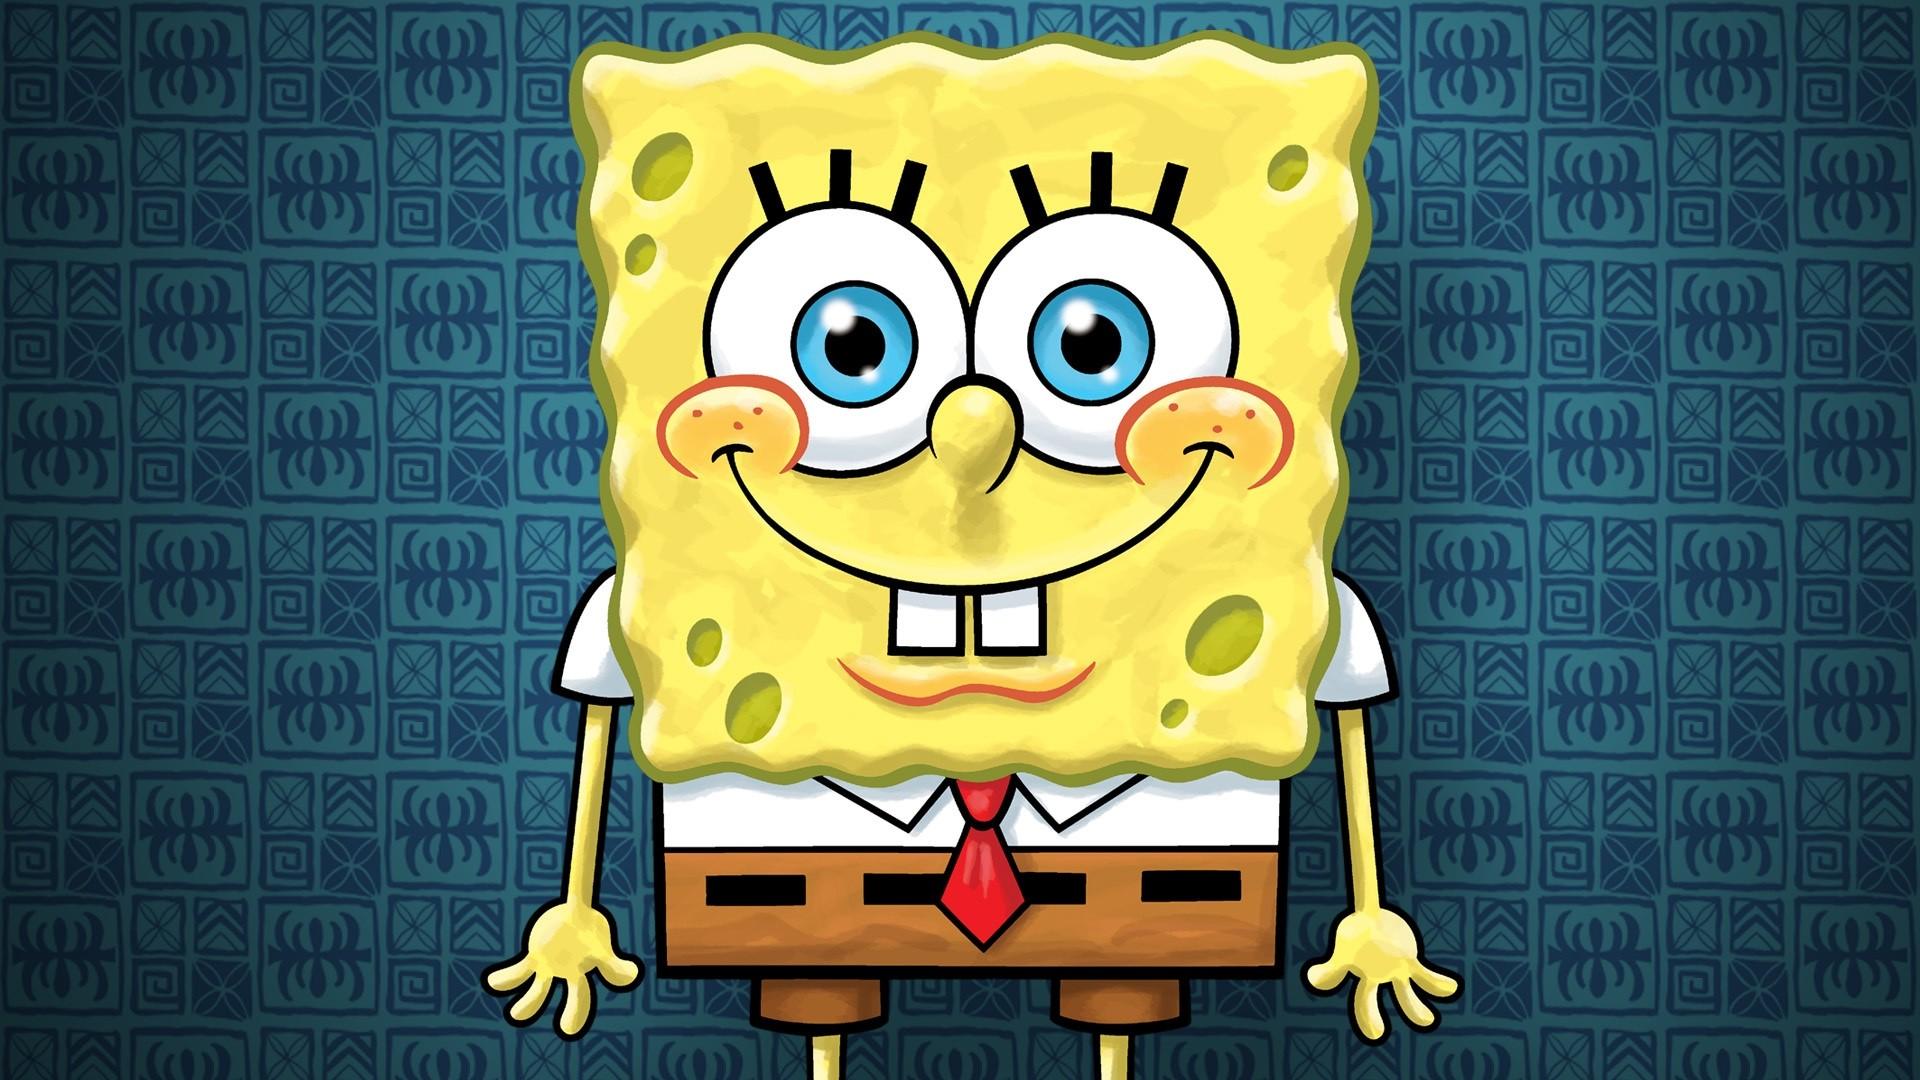 Aesthetic Spongebob Picture